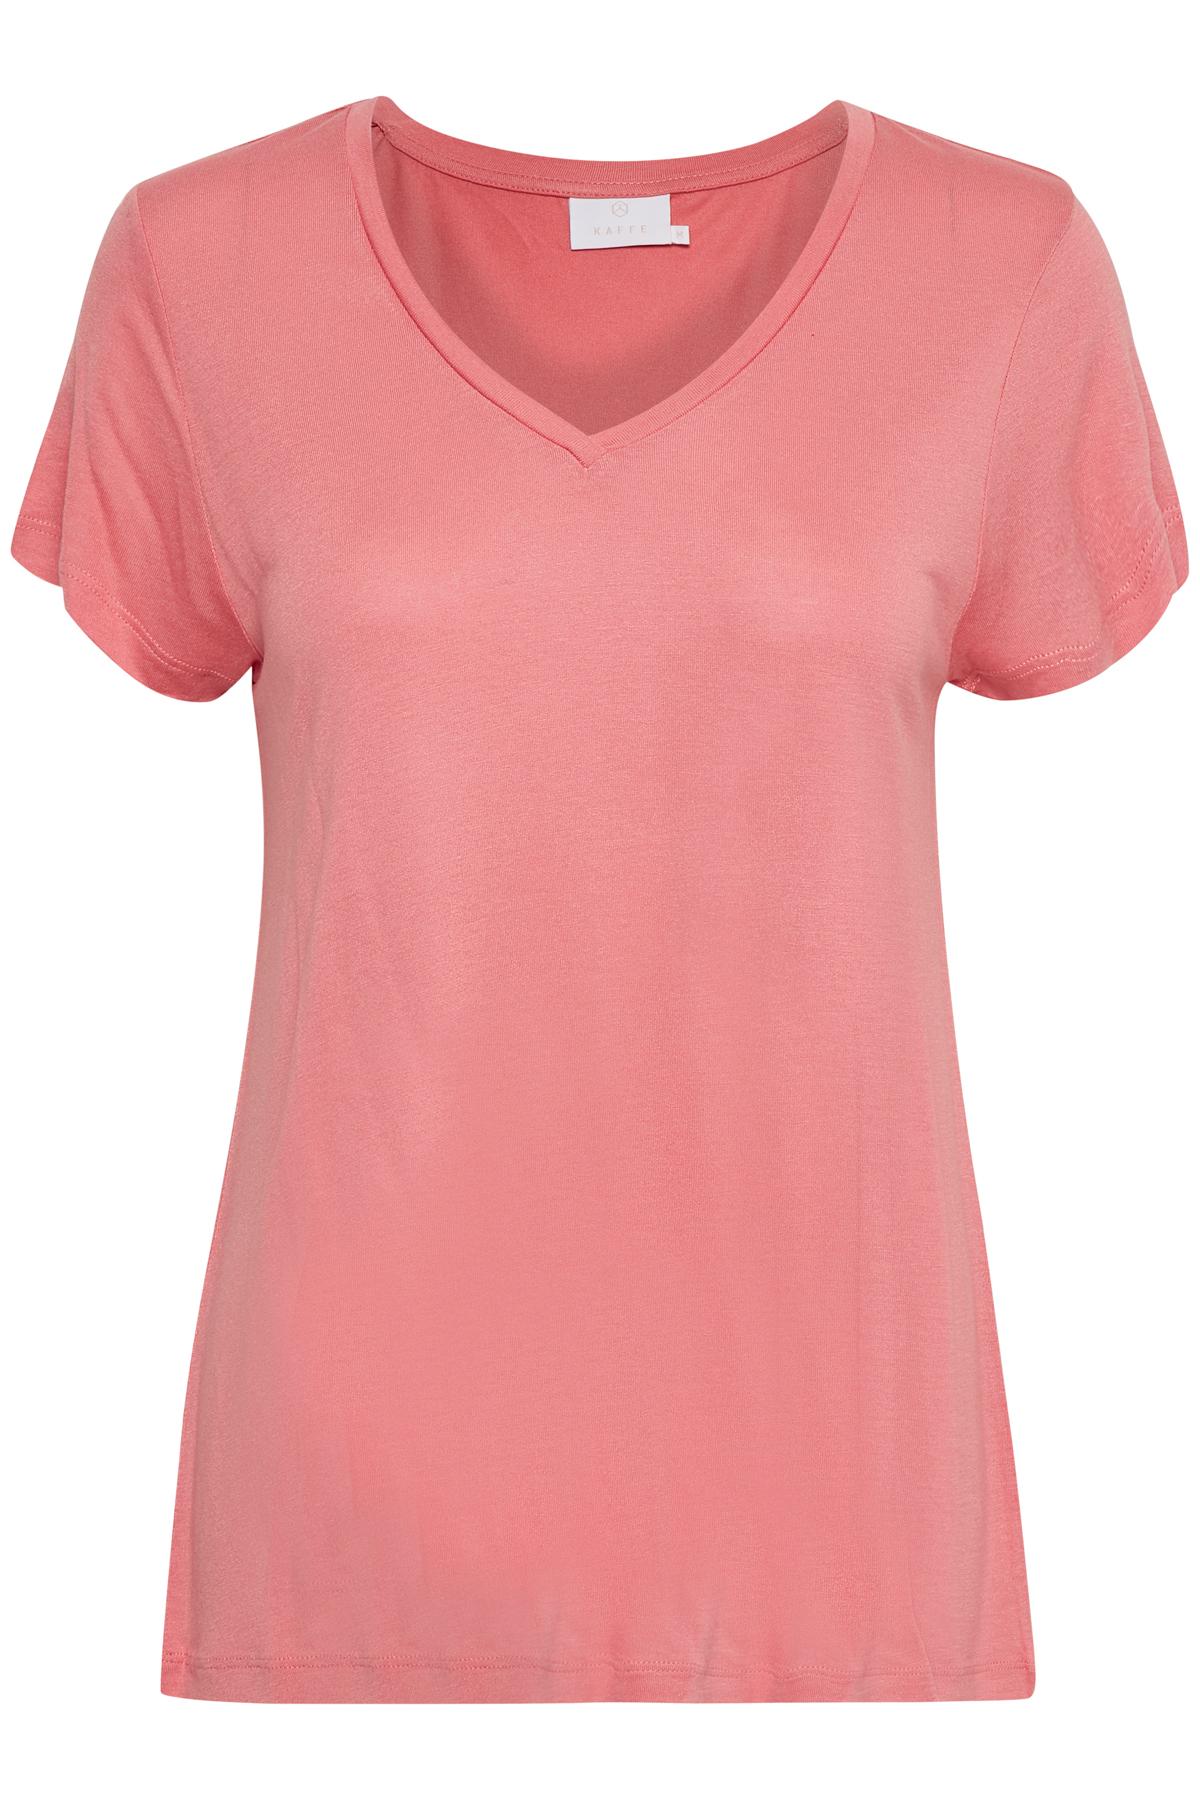 Rosa Kurzarm T-Shirt von Kaffe – Shoppen Sie Rosa Kurzarm T-Shirt ab Gr. XS-XXL hier